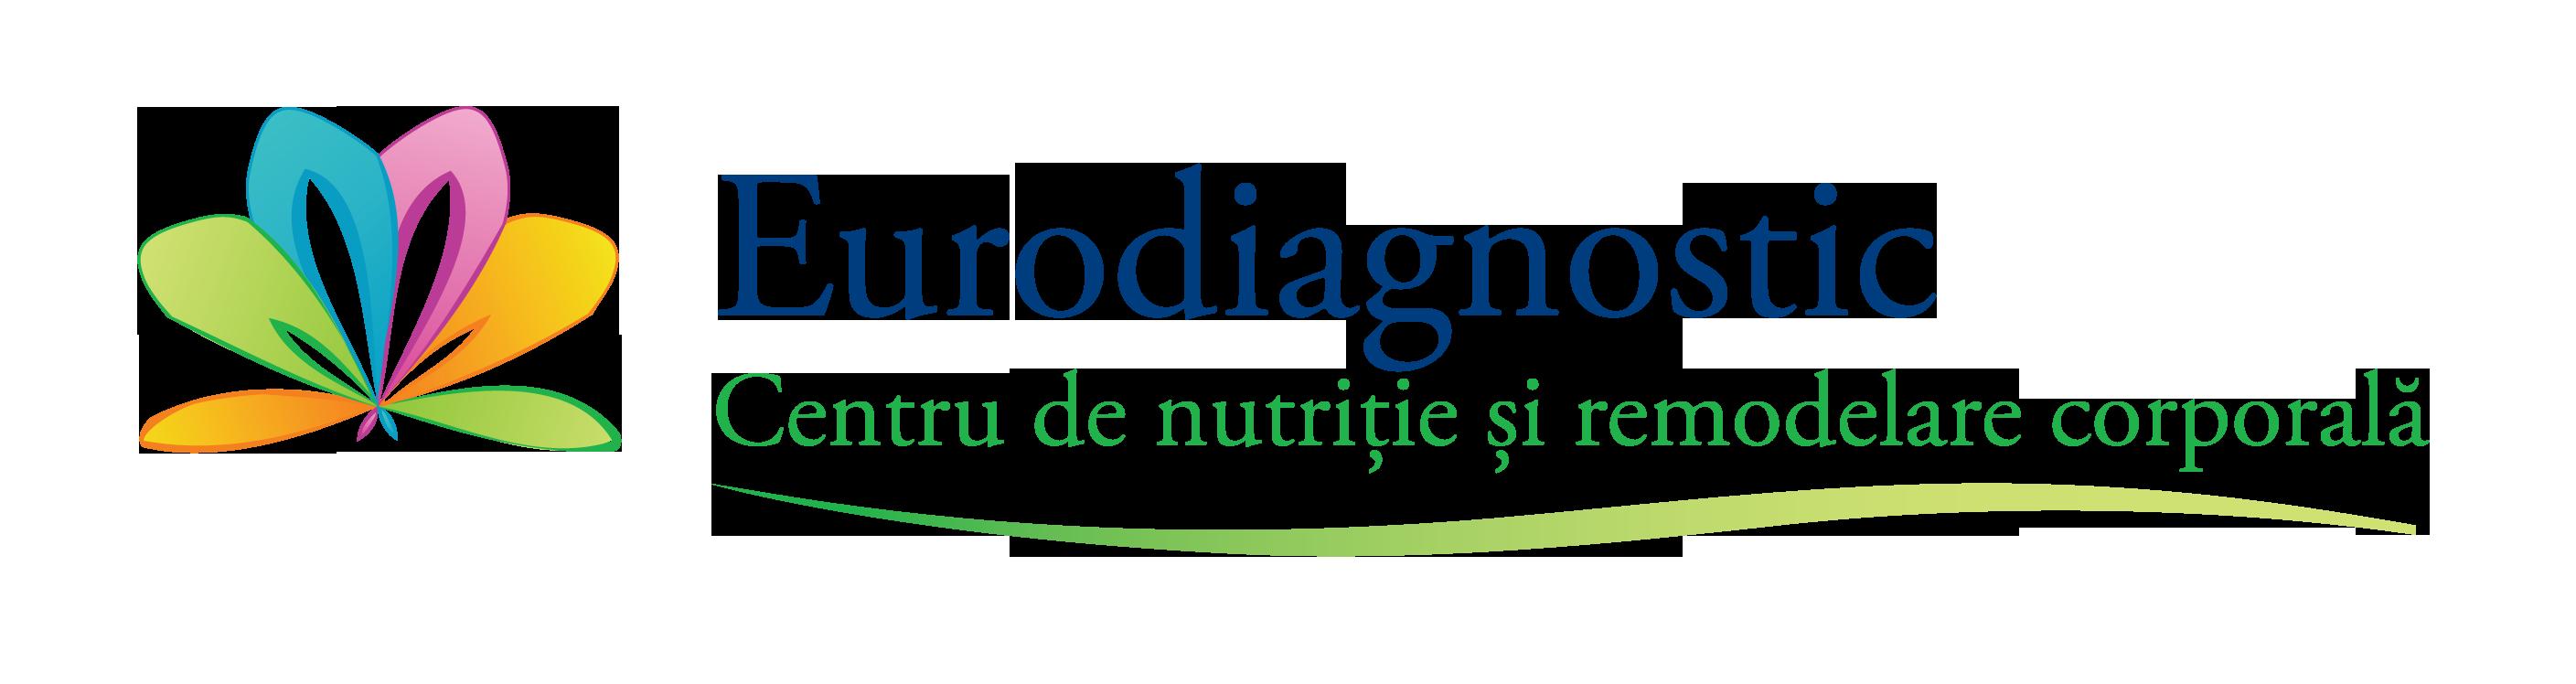 logo-eurodiagnostic